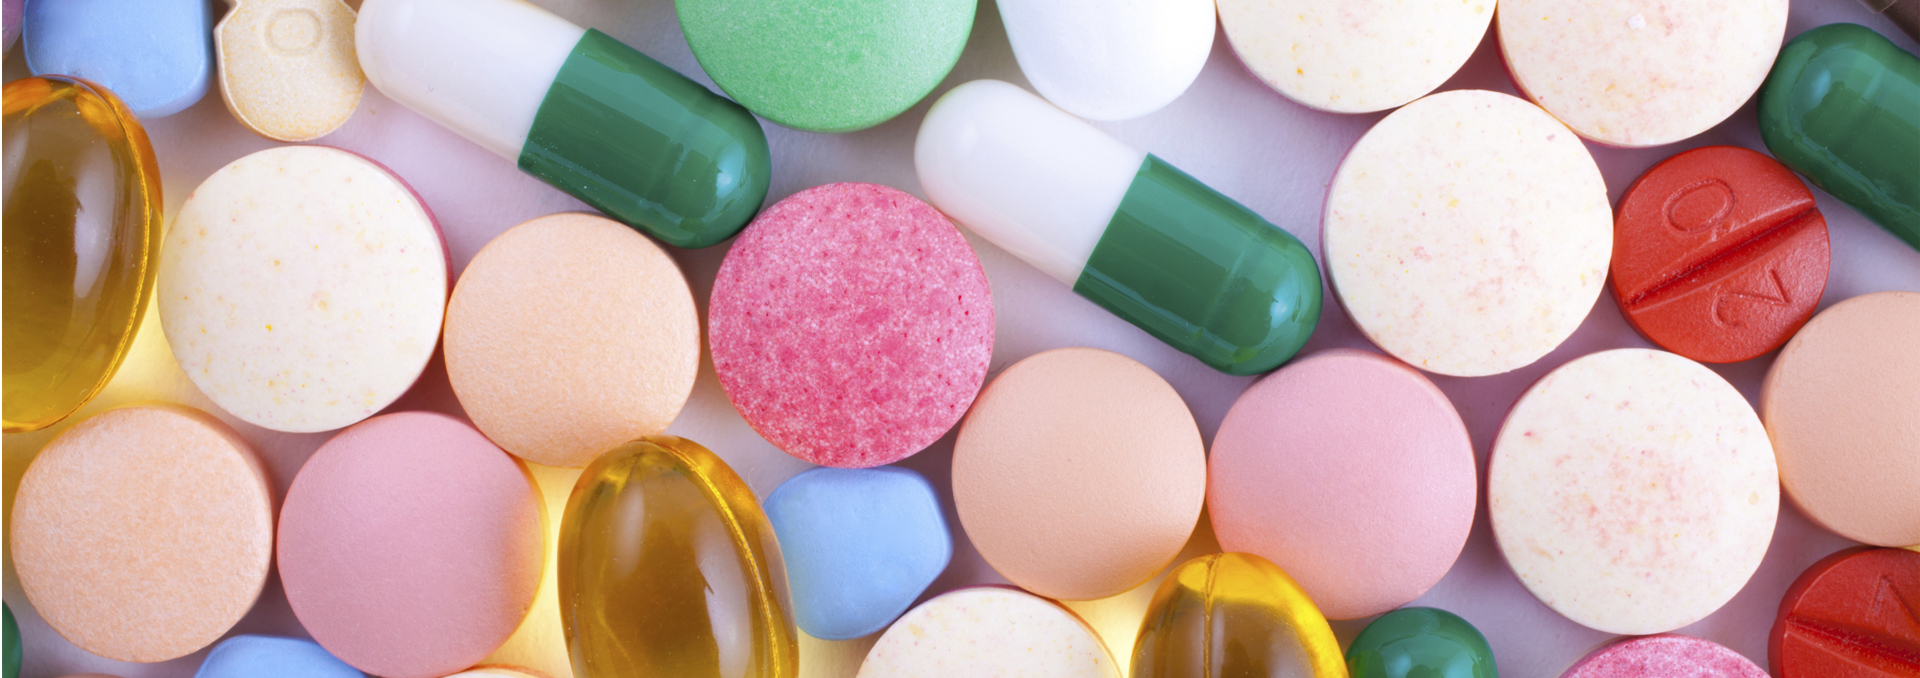 World Class Medicines